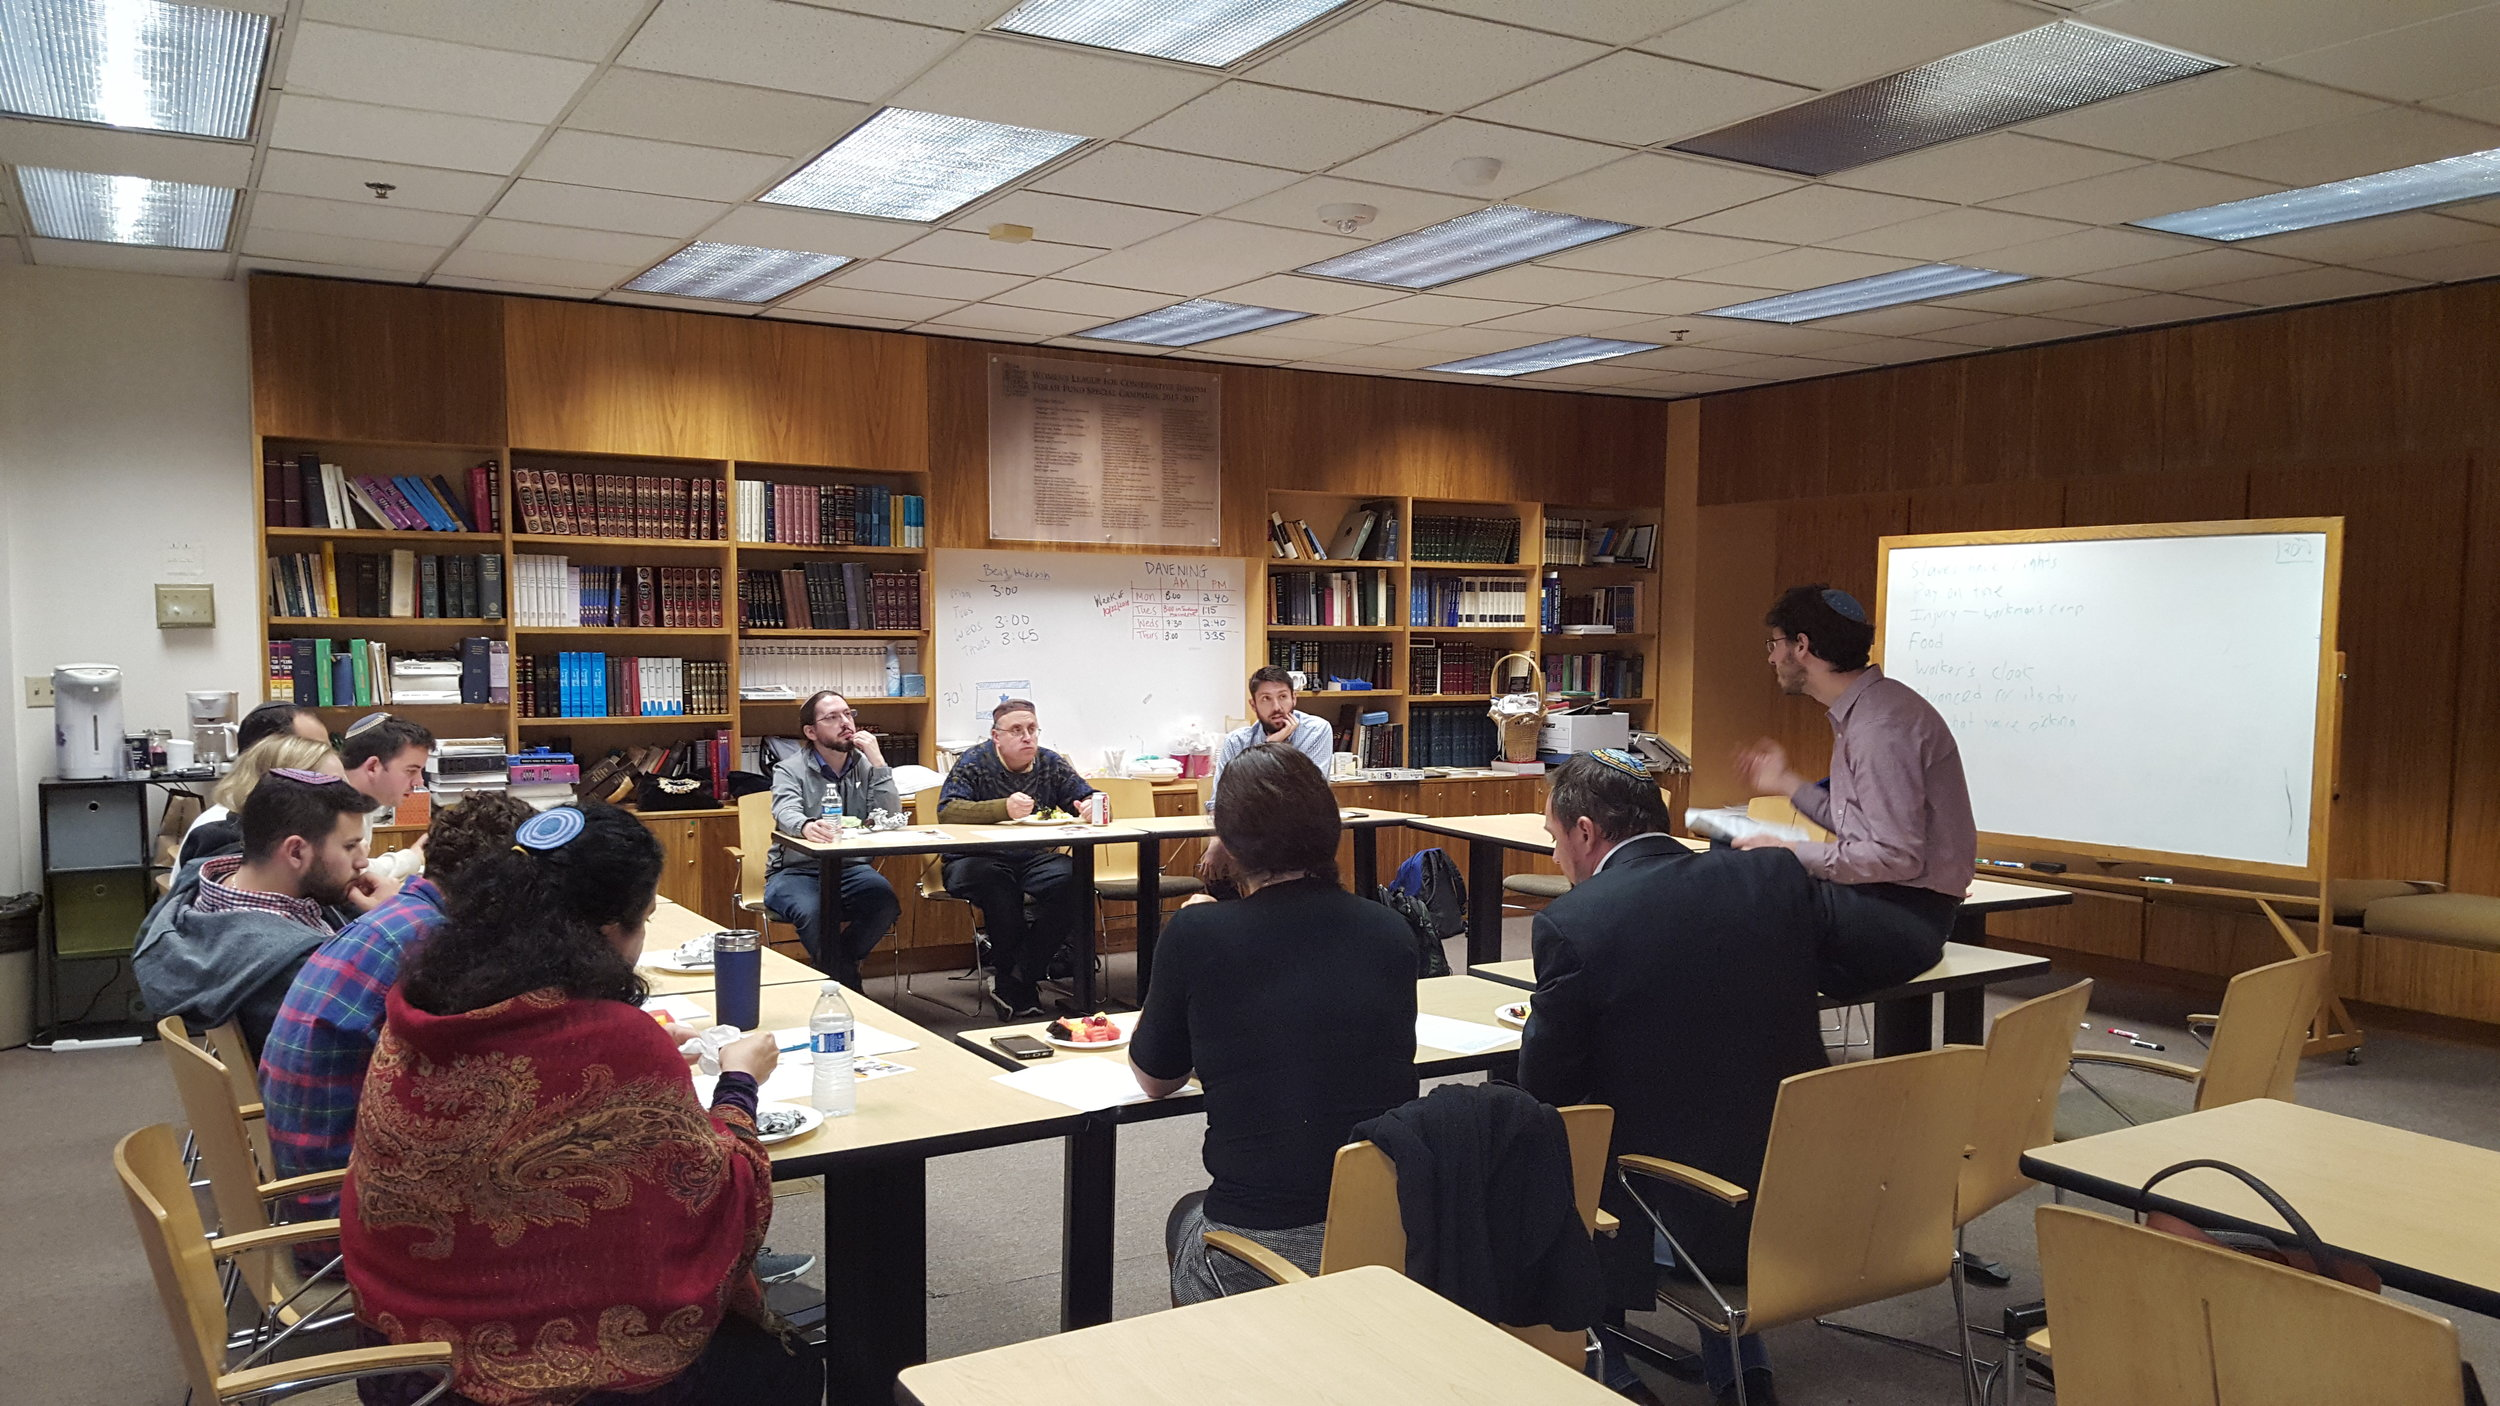 Rabbi Lev at the Ziegler School of Rabbinic Studies